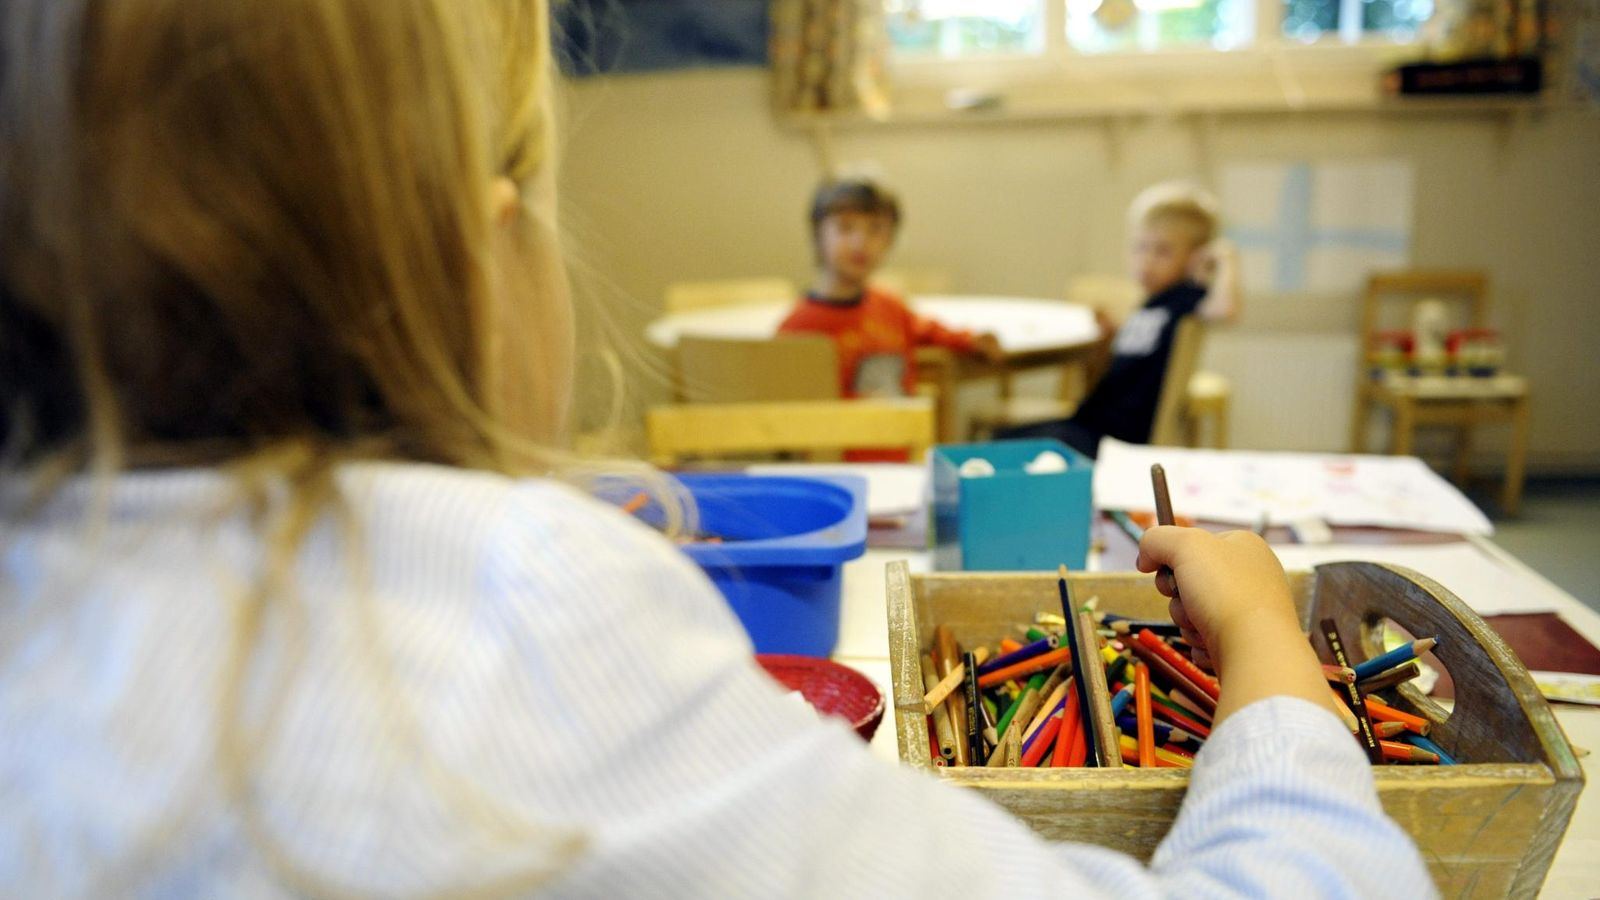 lapsen oikeudet laki Kokkola